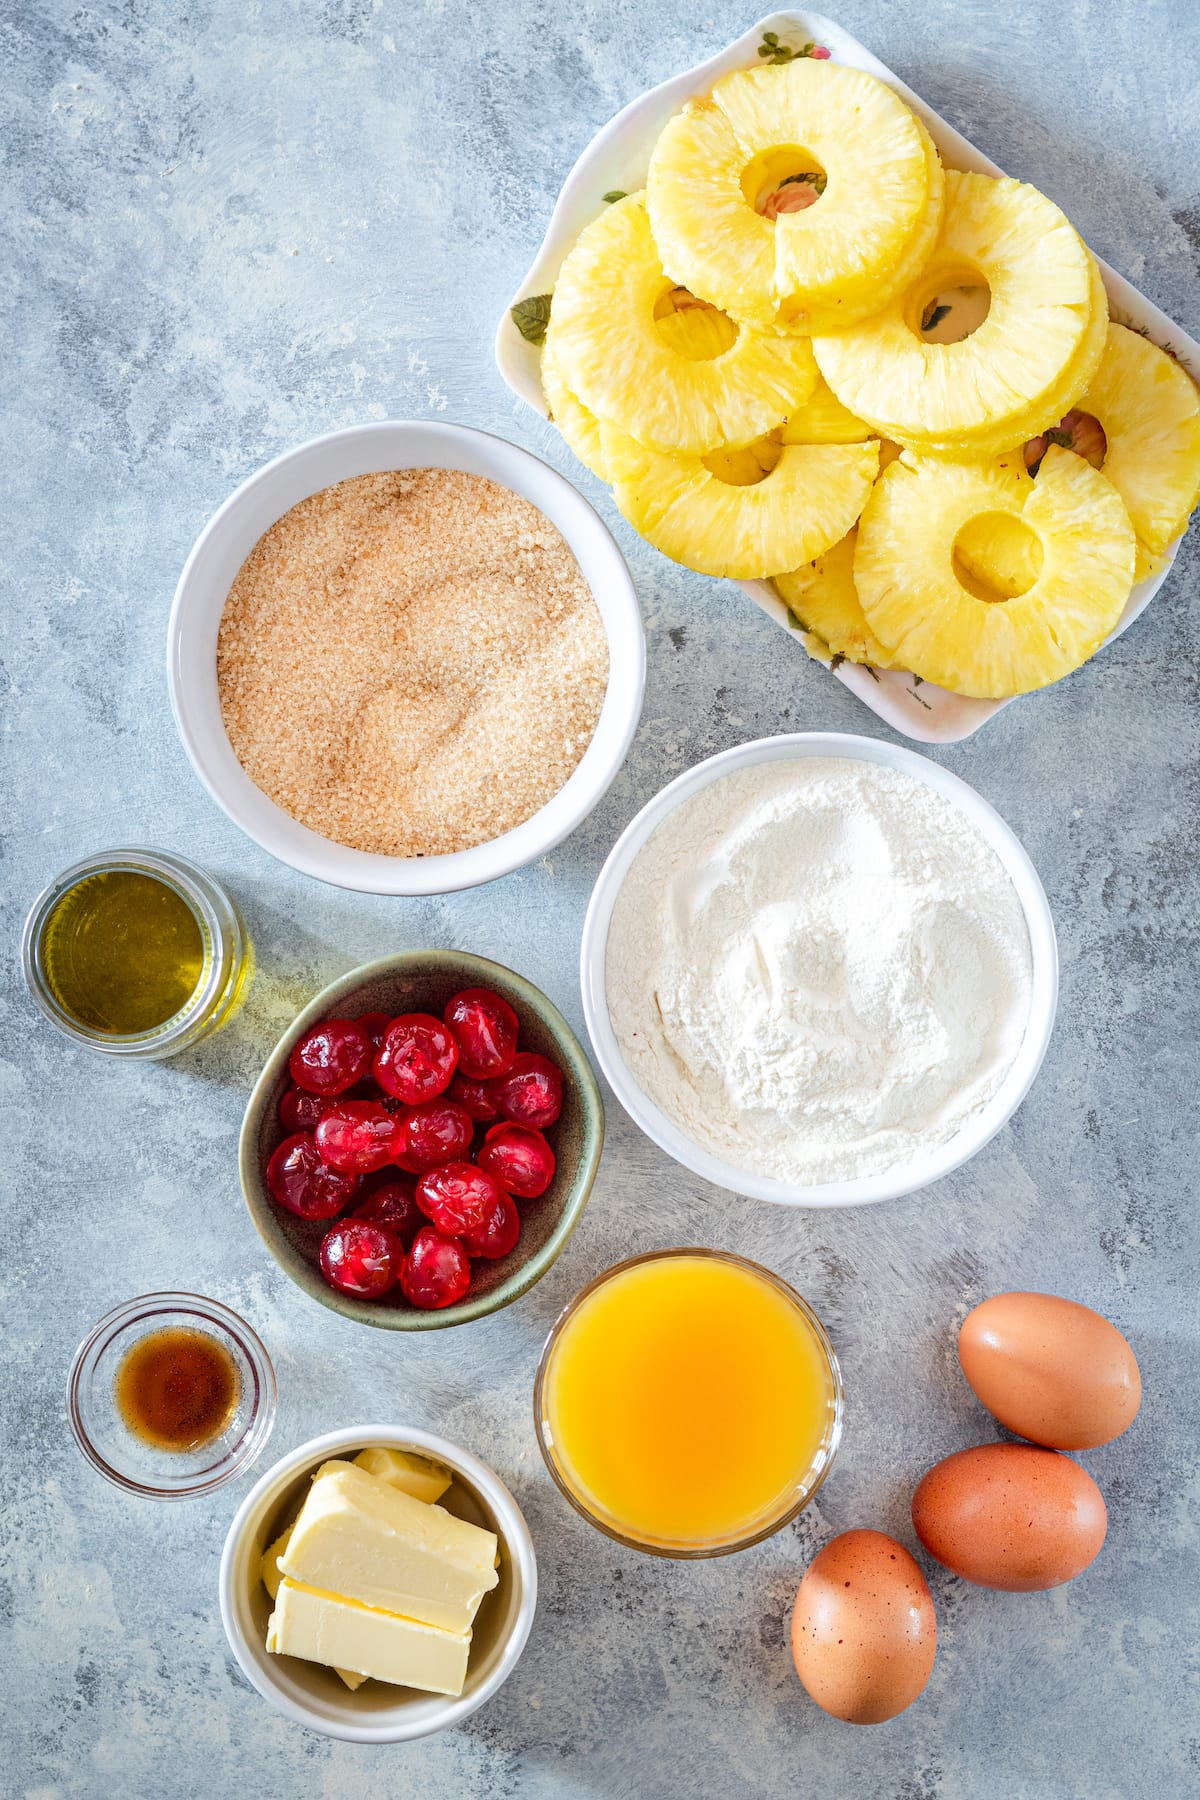 Ingredients for pineapple upside down cake.